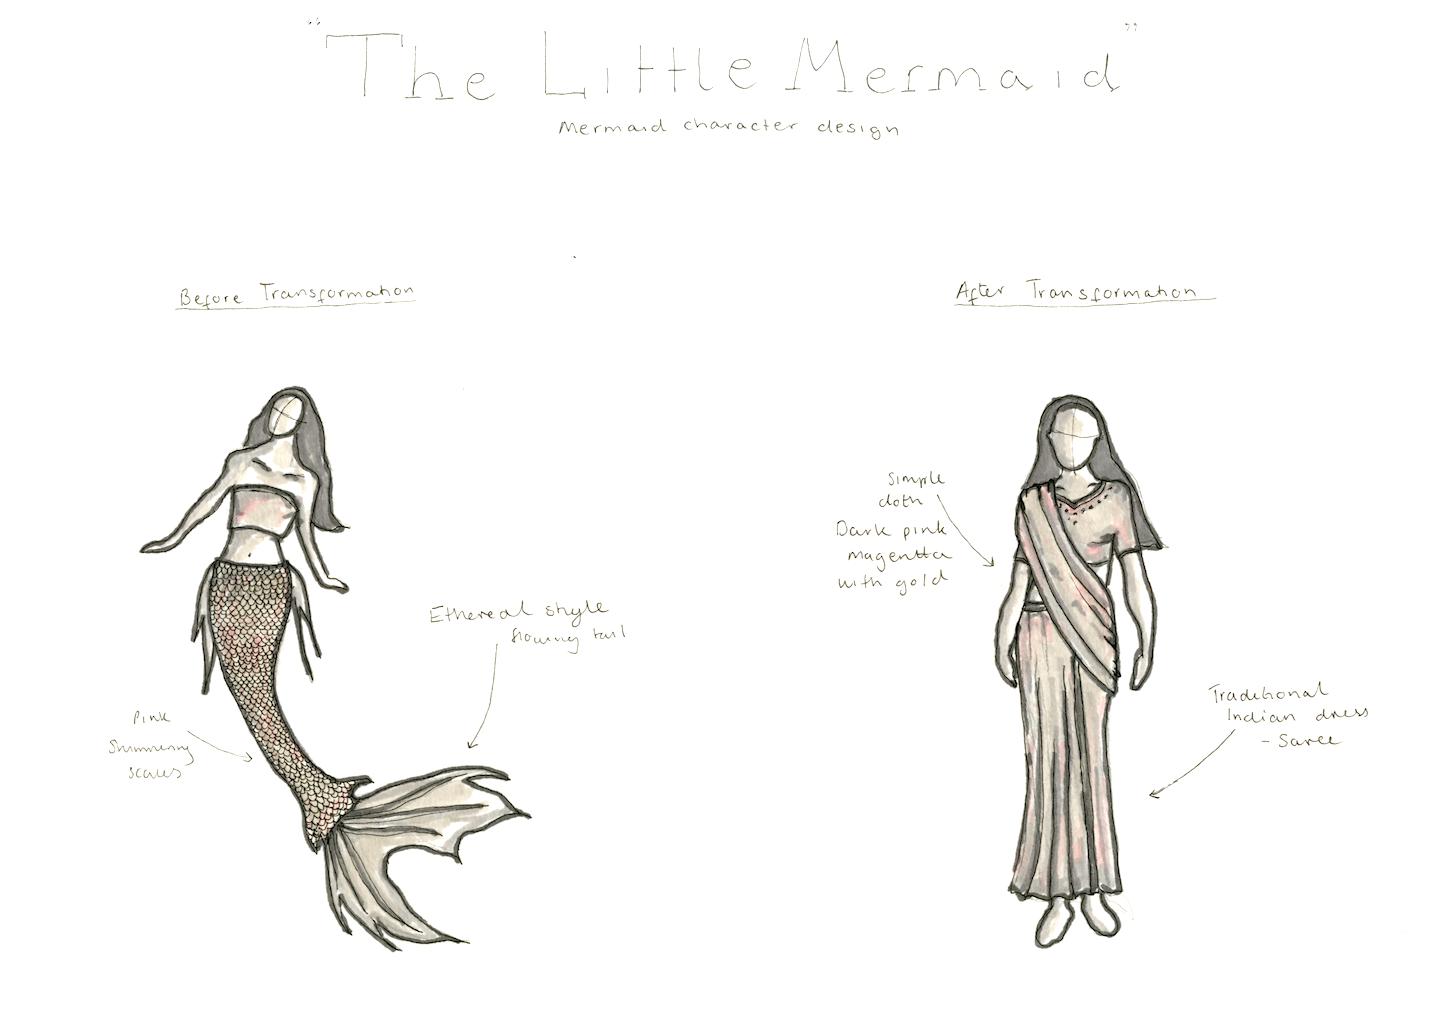 Costume sketch